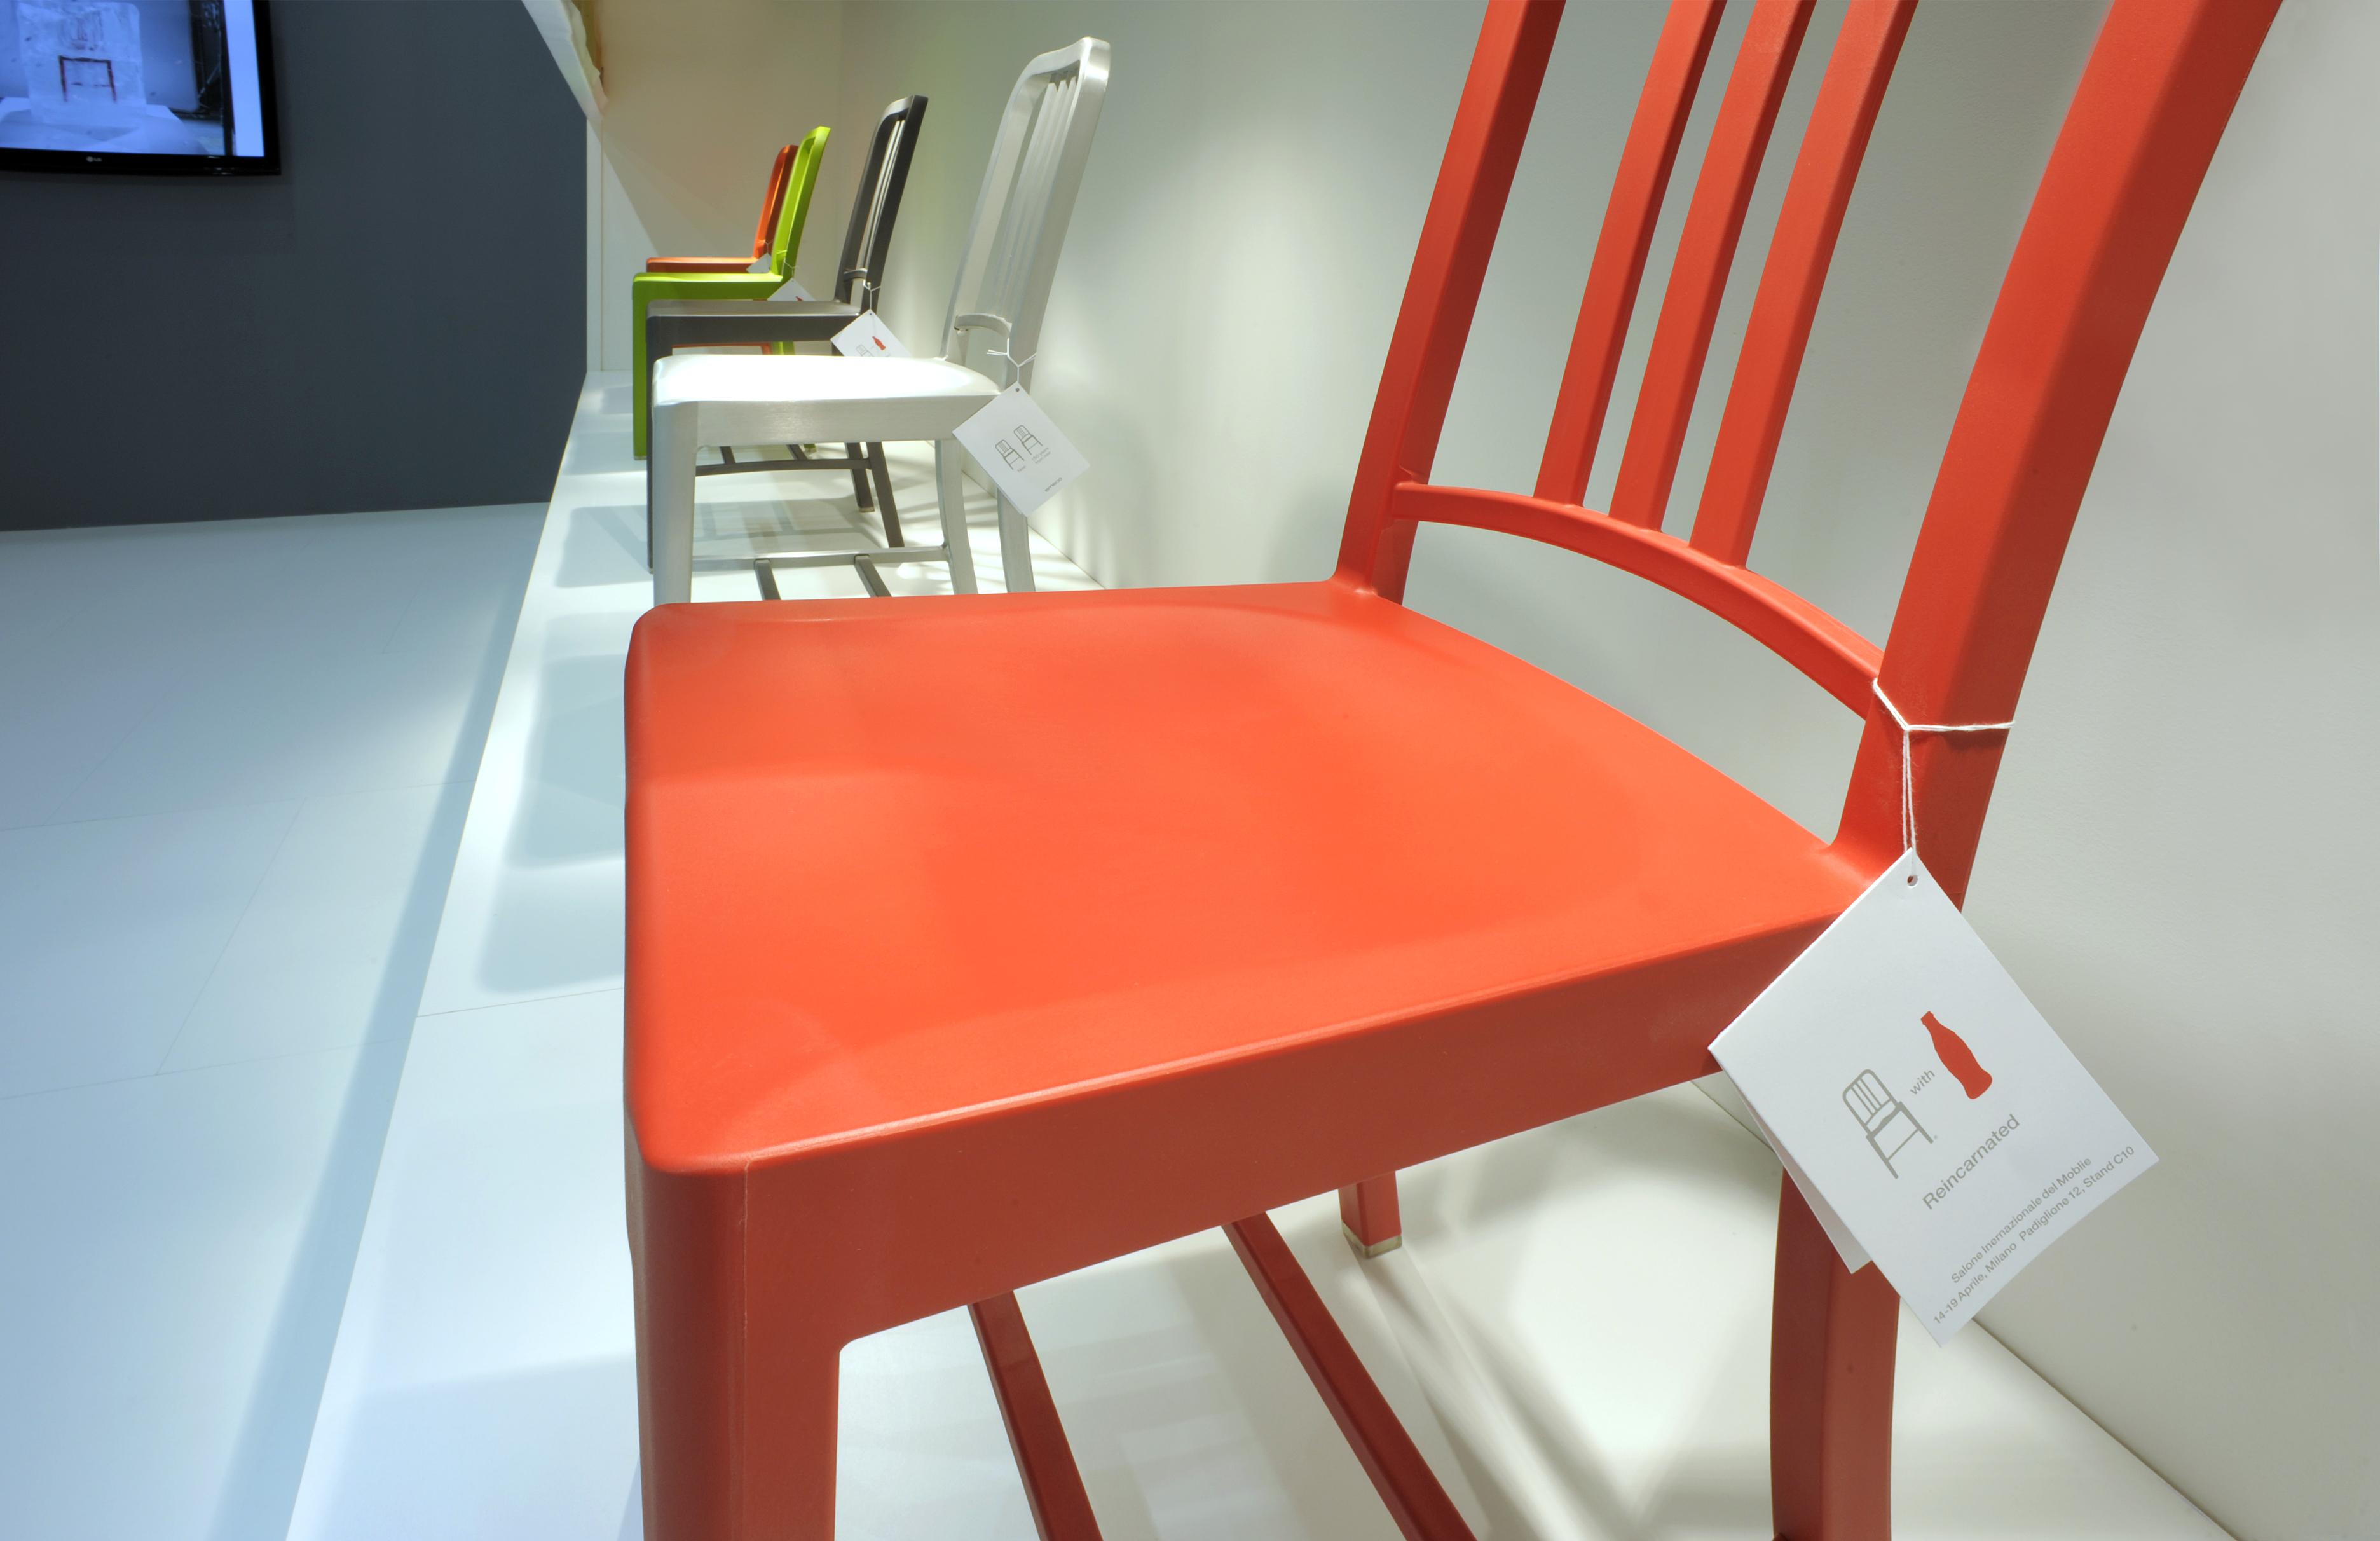 furniture of waste daily design idea